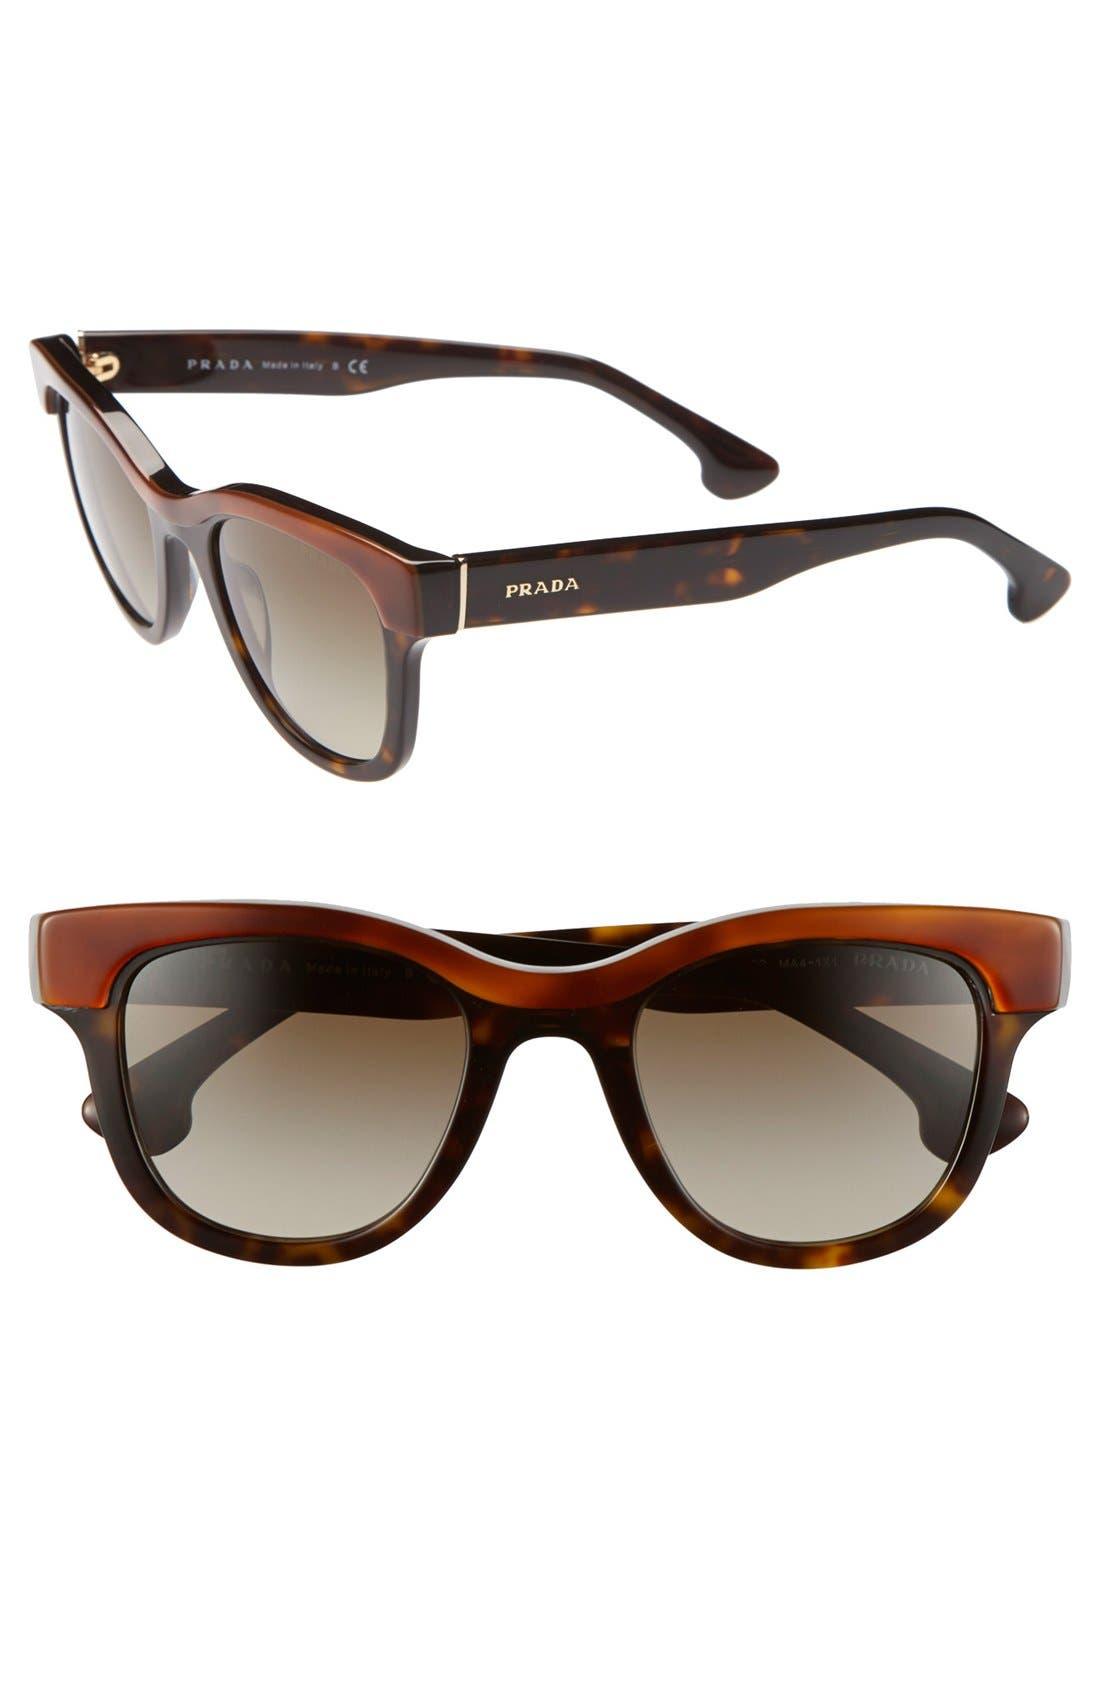 Alternate Image 1 Selected - Prada 'Crow' 49mm Sunglasses